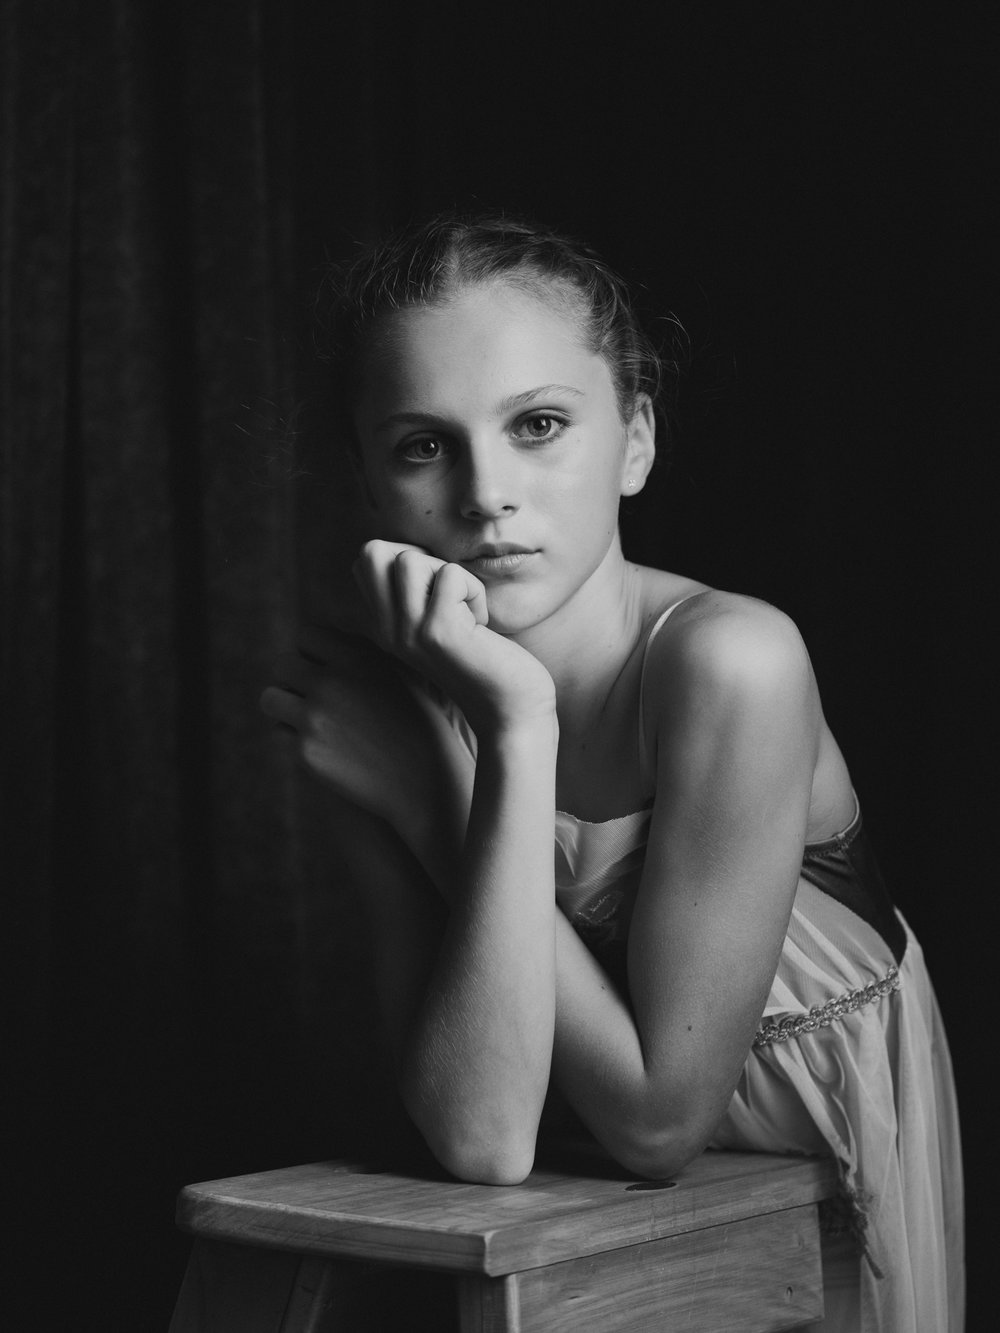 Susannah-002.jpg